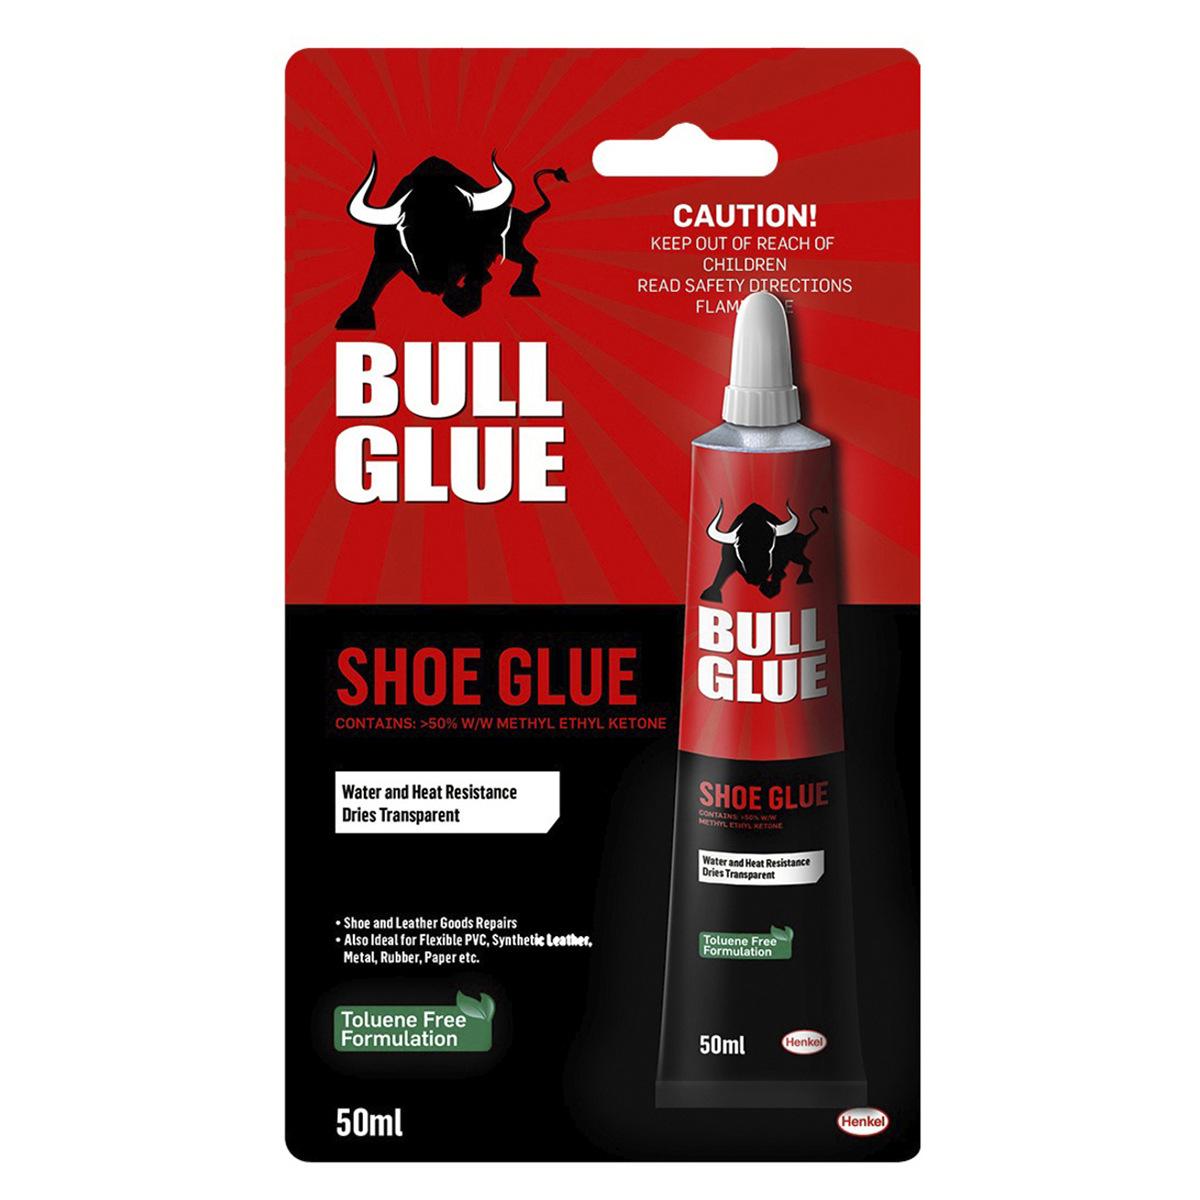 Bull Glue Shoe Glue 50ml Kmart